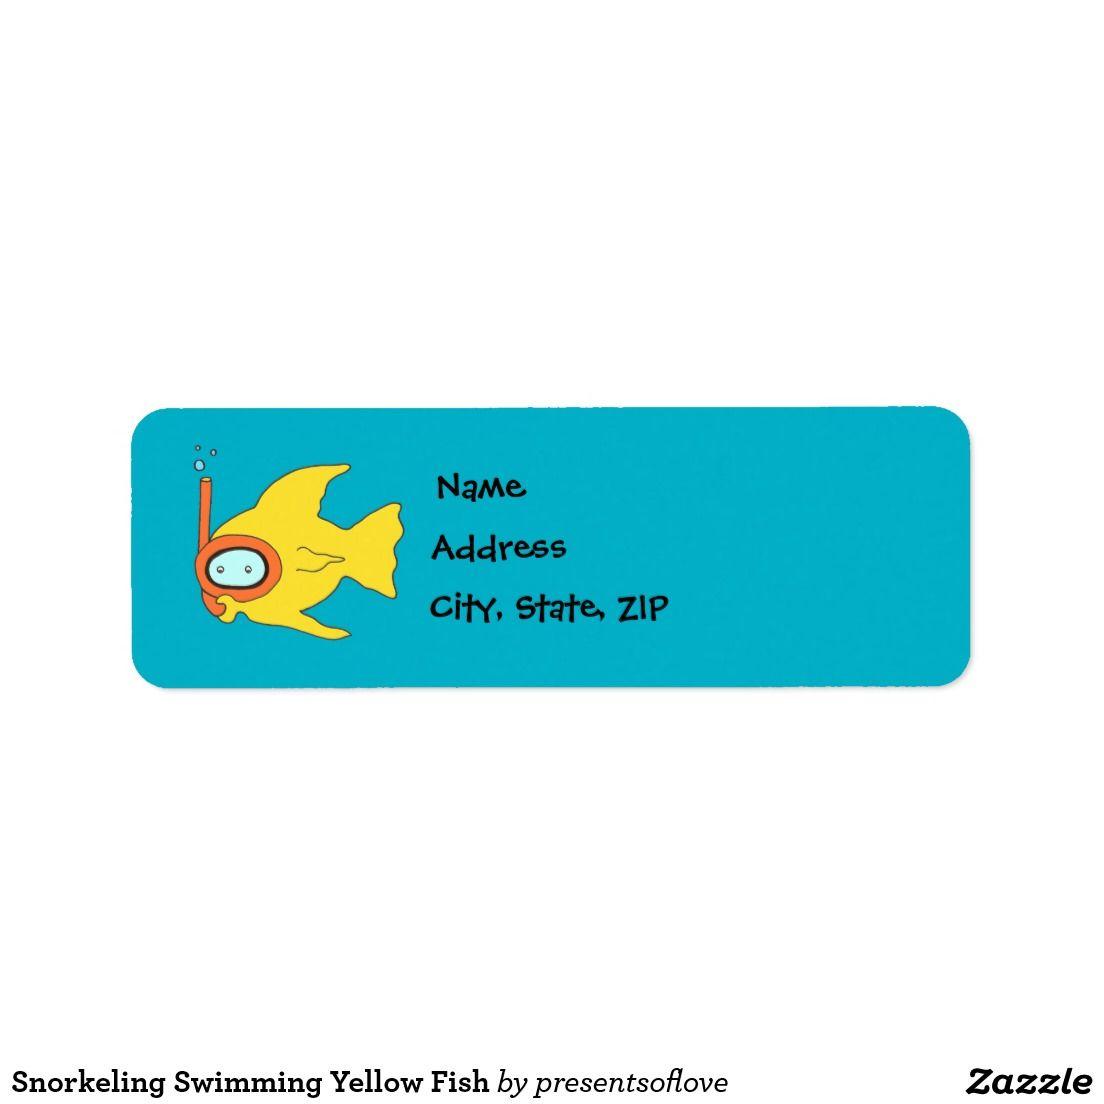 Snorkeling Swimming Yellow Fish Label